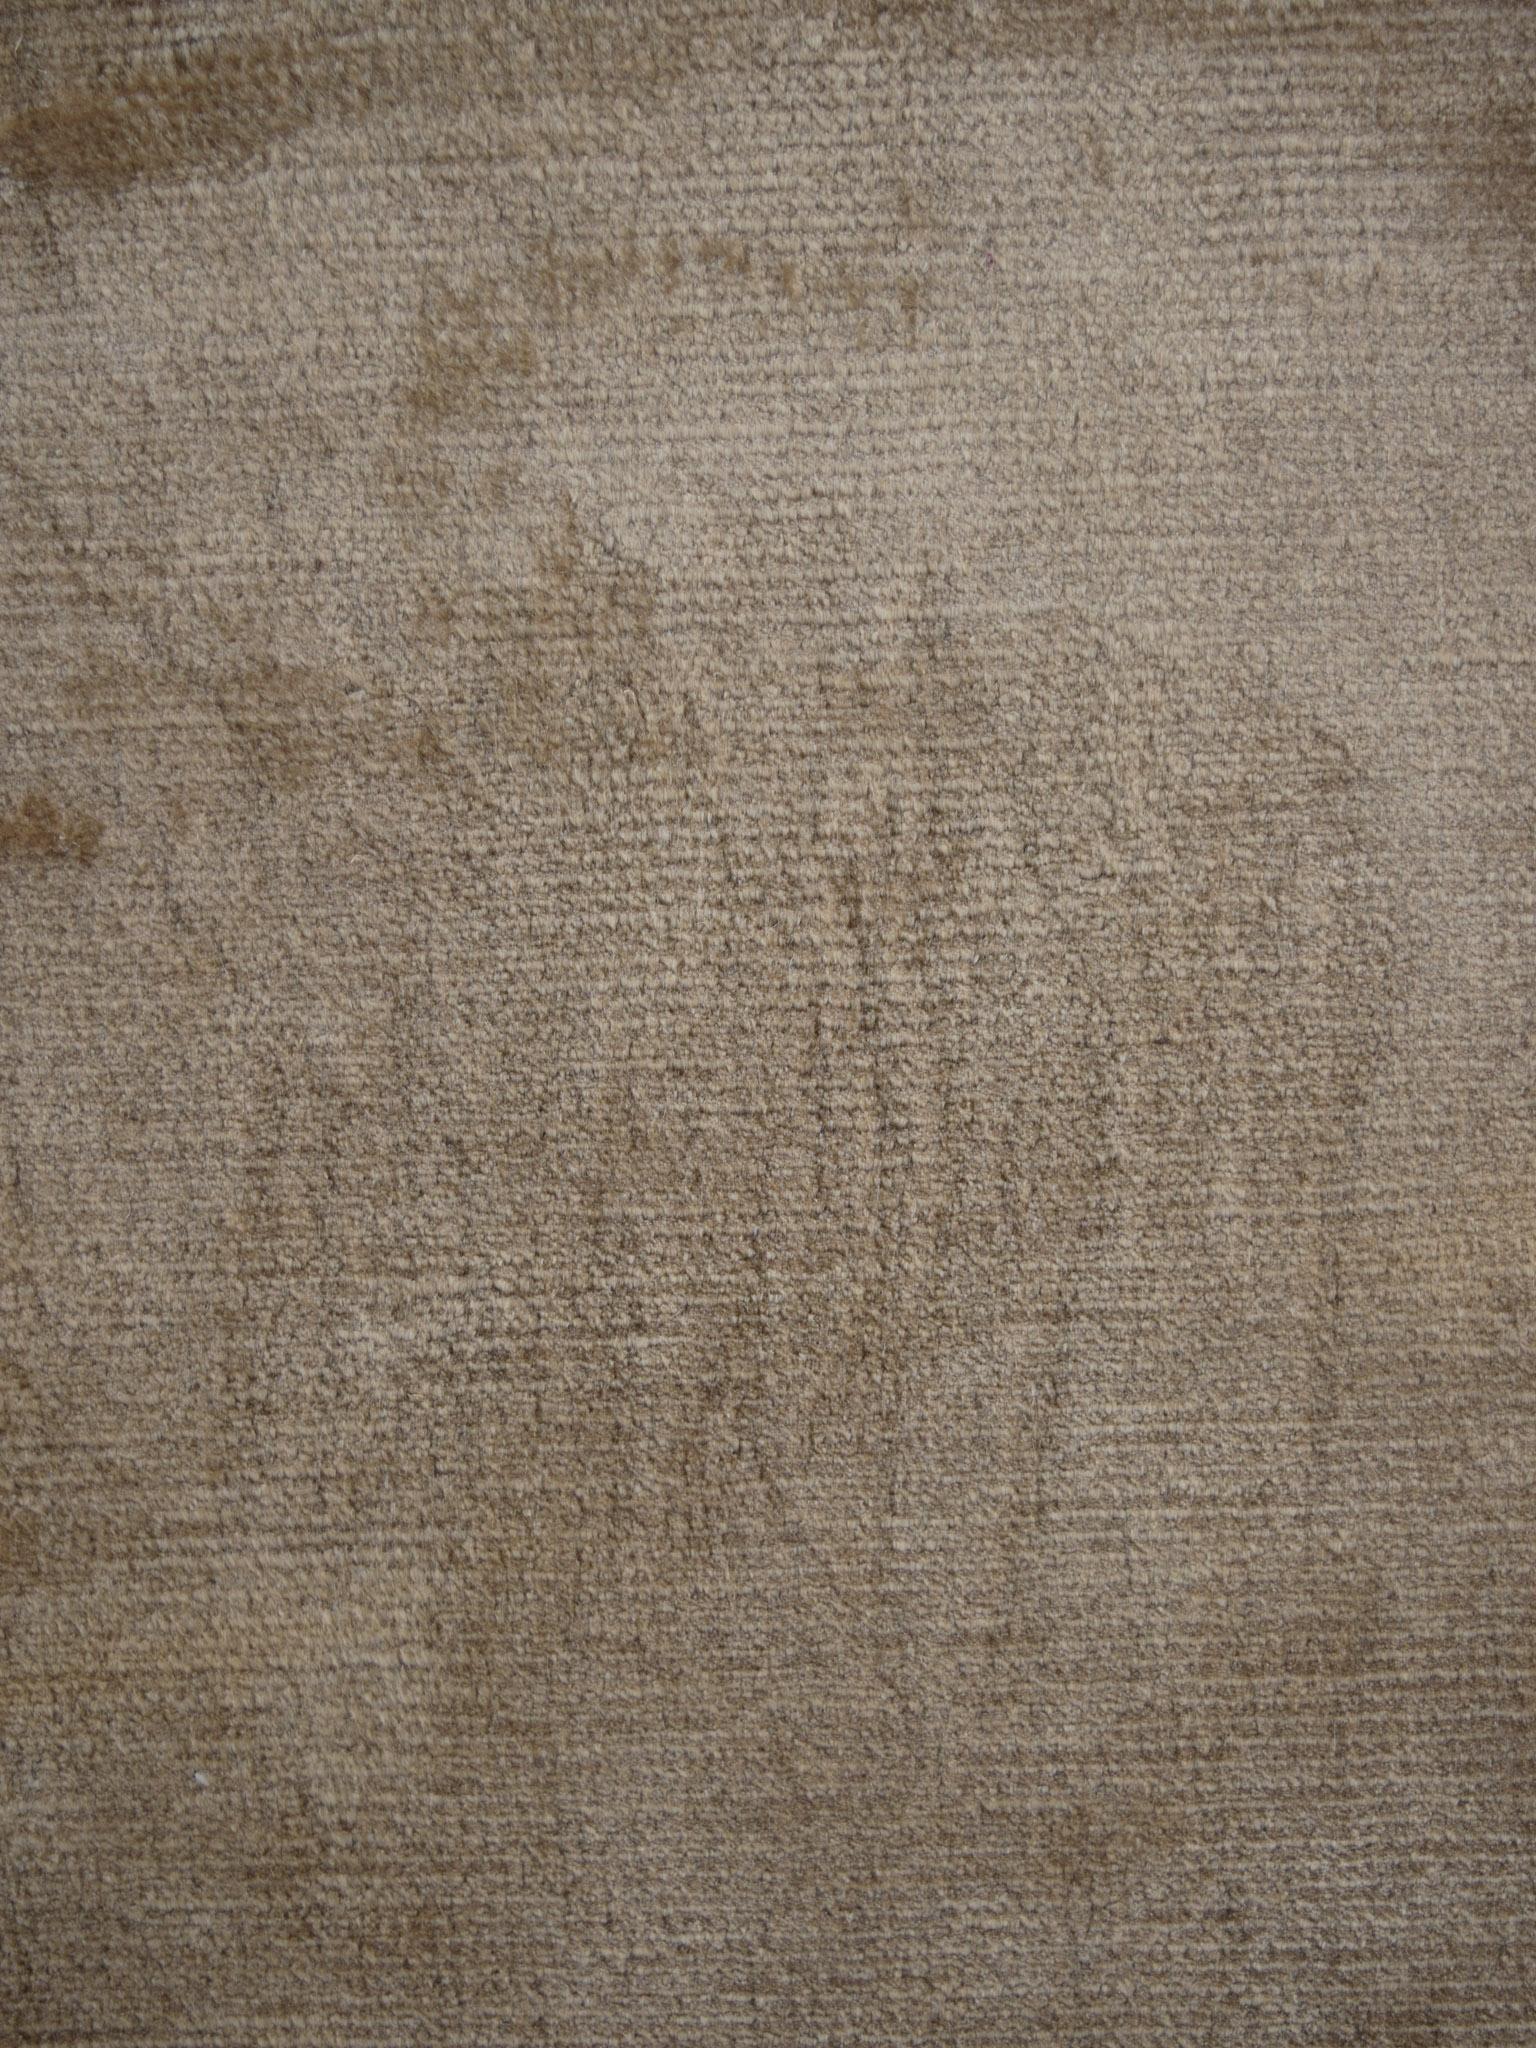 Muga Silk Solid HSPSA16113/318